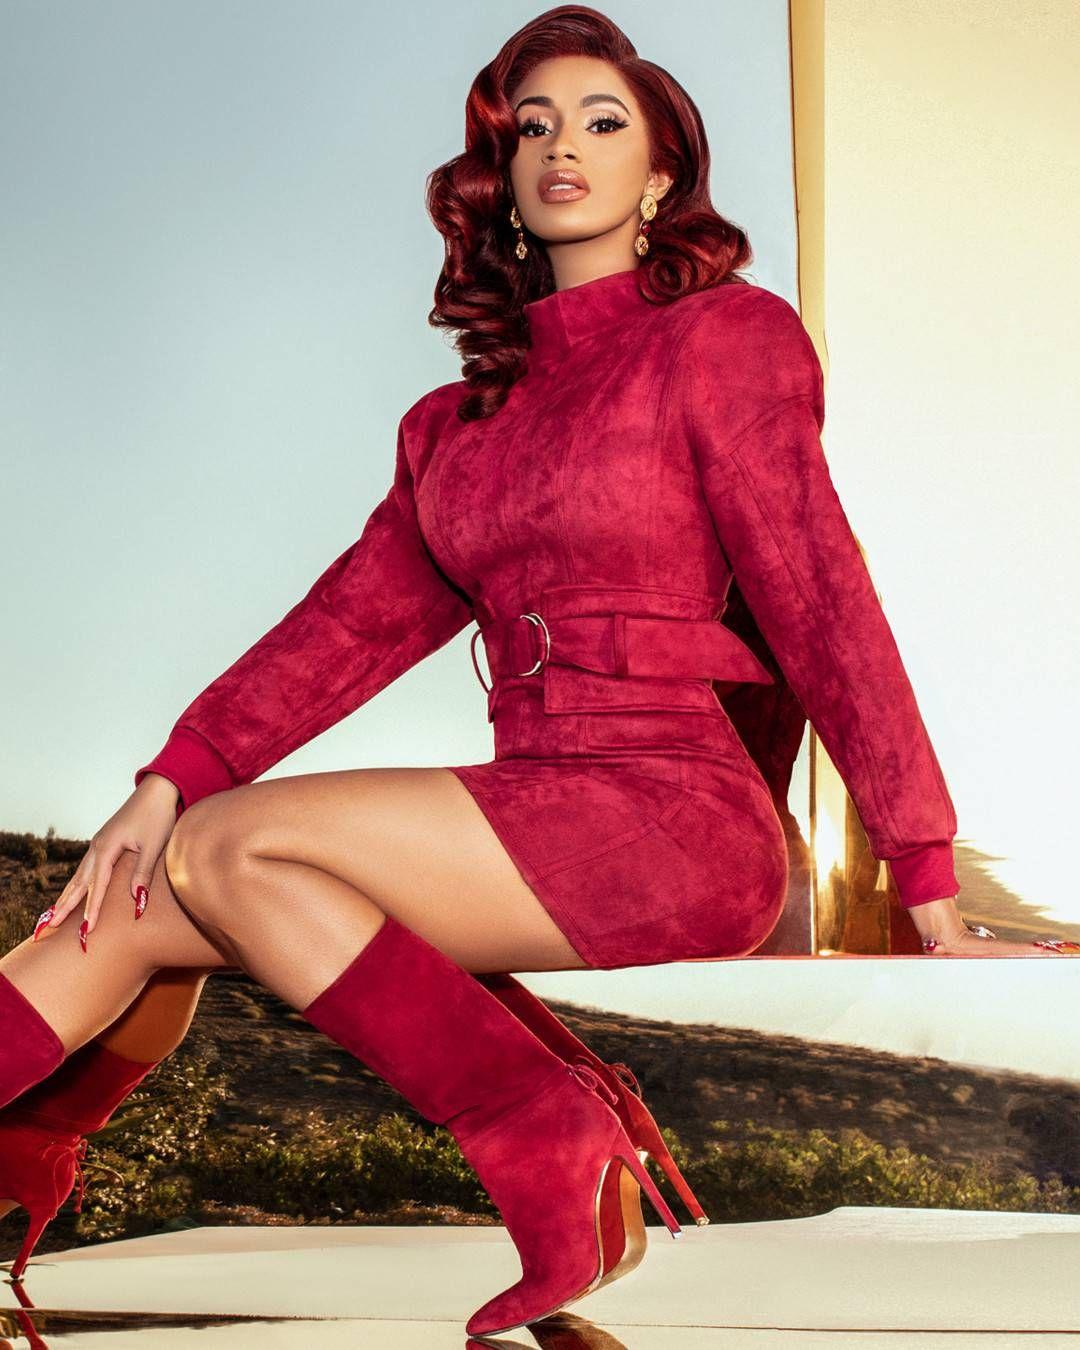 Cardi B Rocks A Fashion Nova Dress And Boots